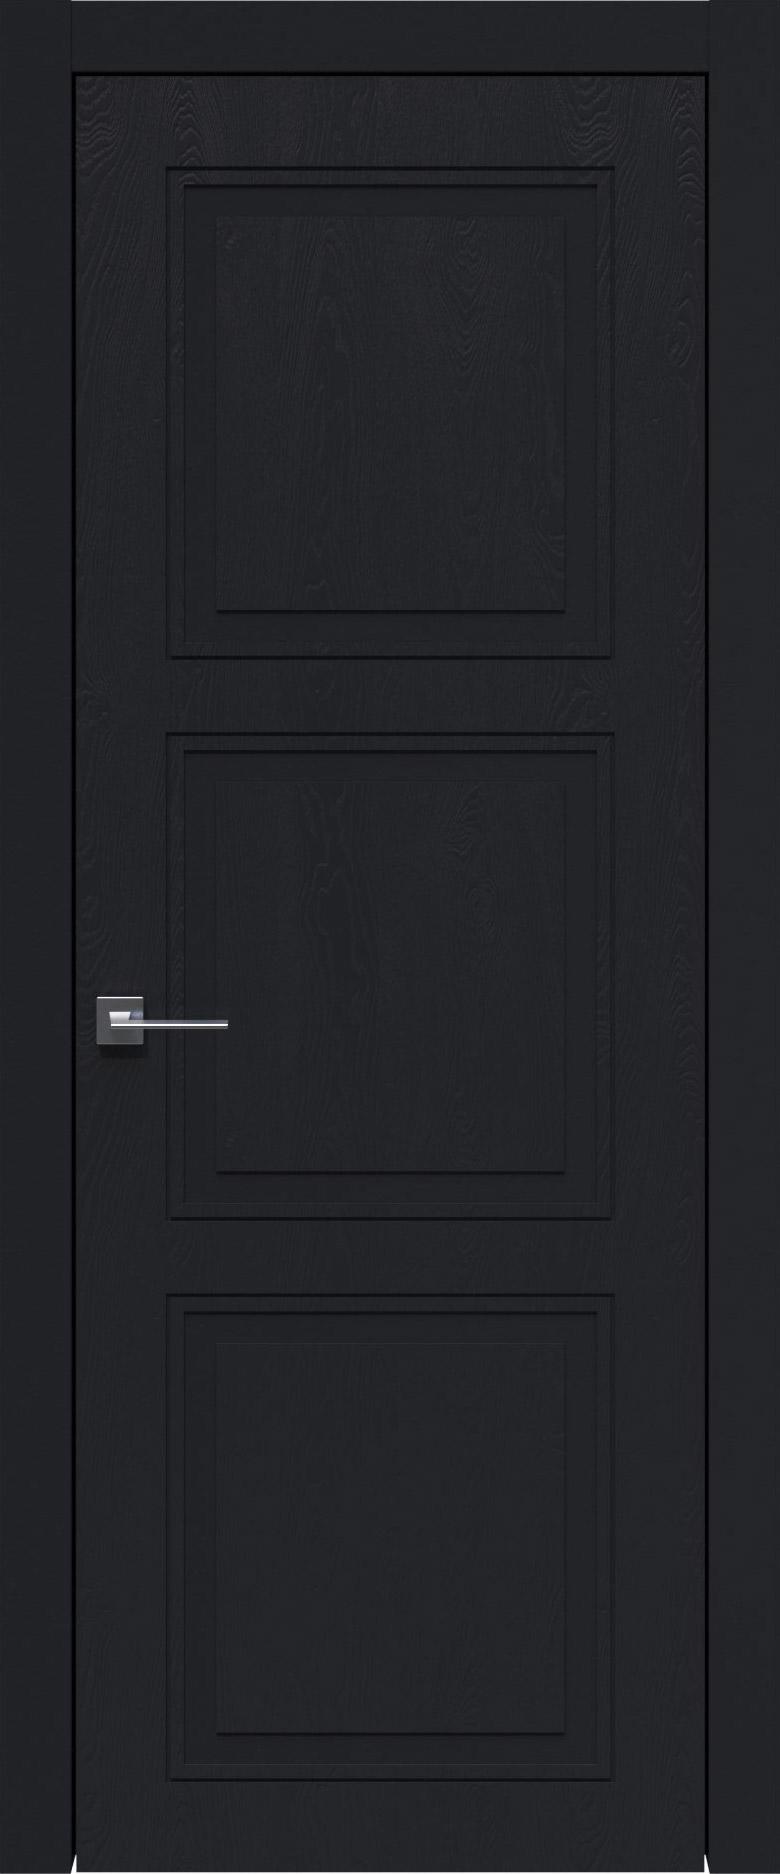 Milano Neo Classic цвет - Черная эмаль по шпону (RAL 9004) Без стекла (ДГ)